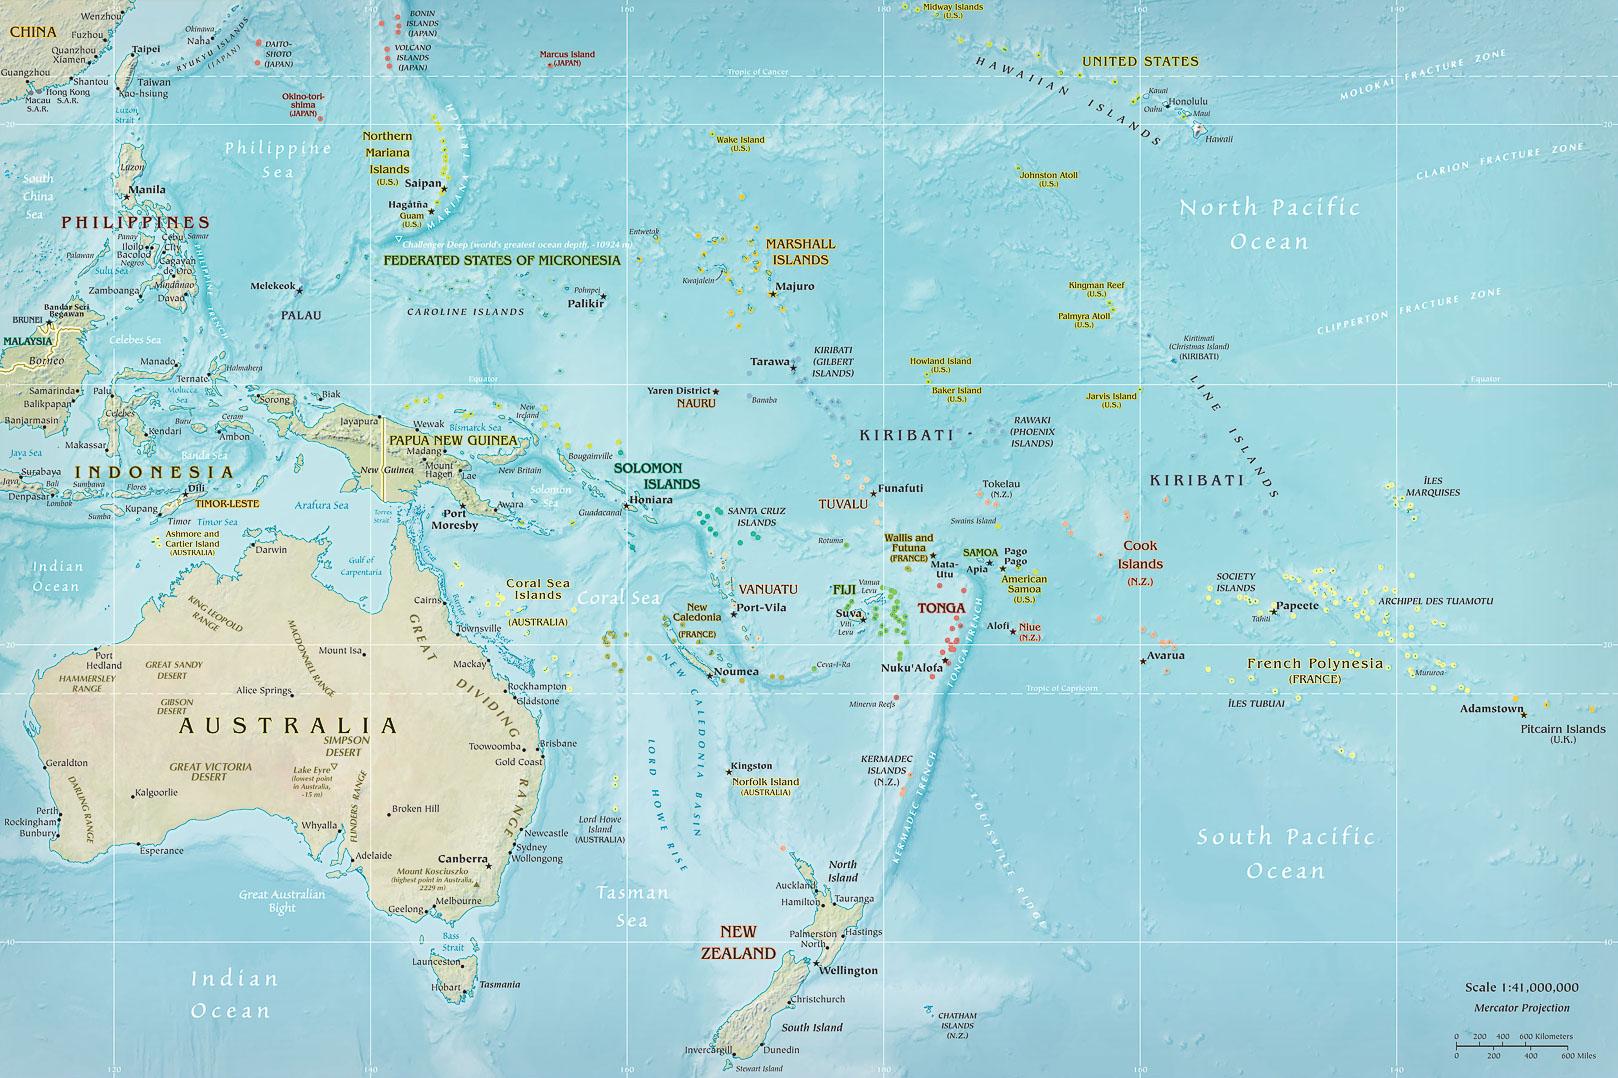 карта Океании: Полинезия, Микронезия, Меланезия